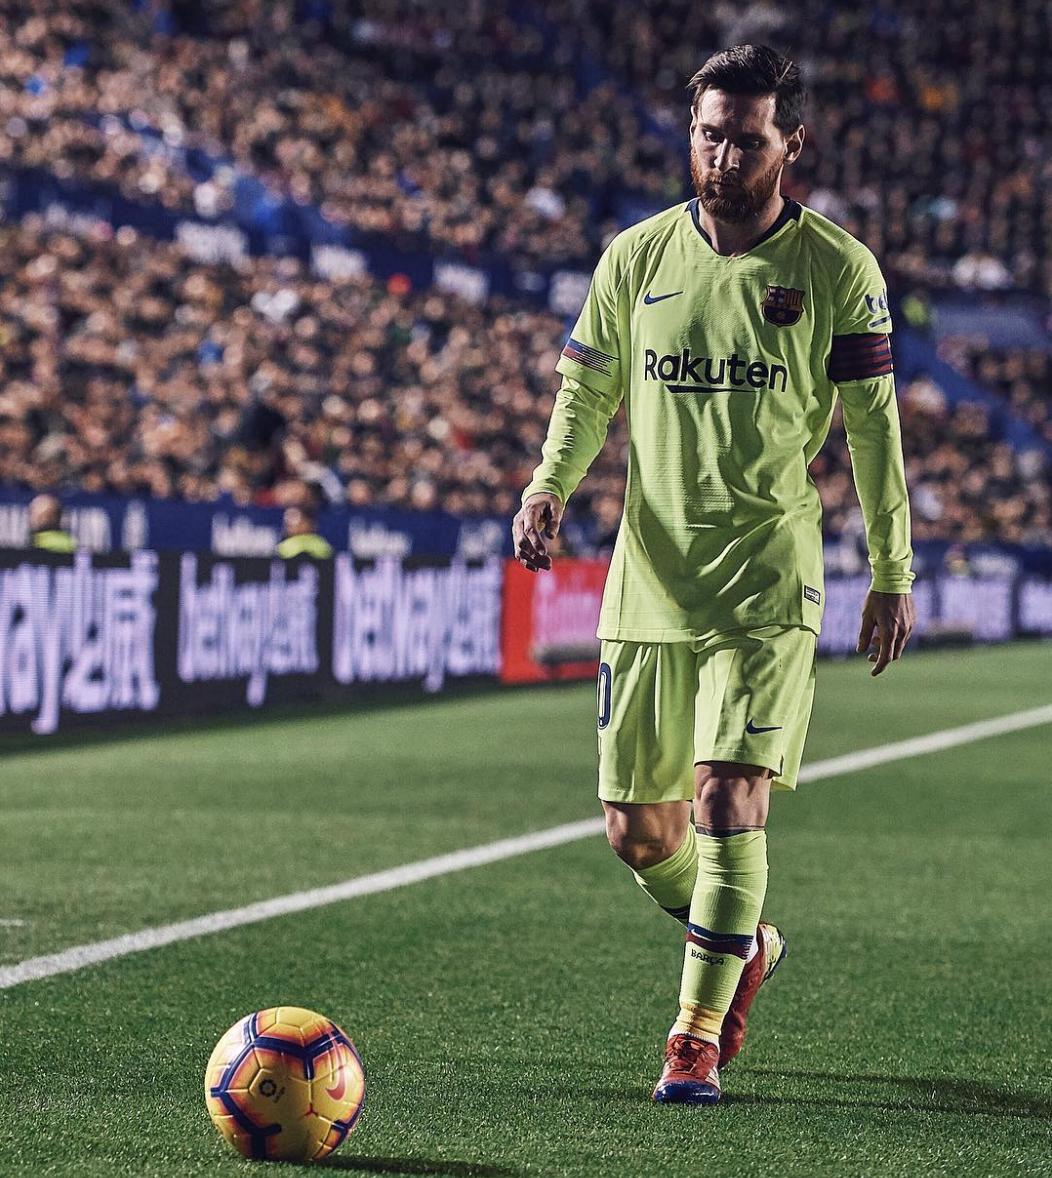 Leo Messi Ucl Leo Messi Messi Soccer